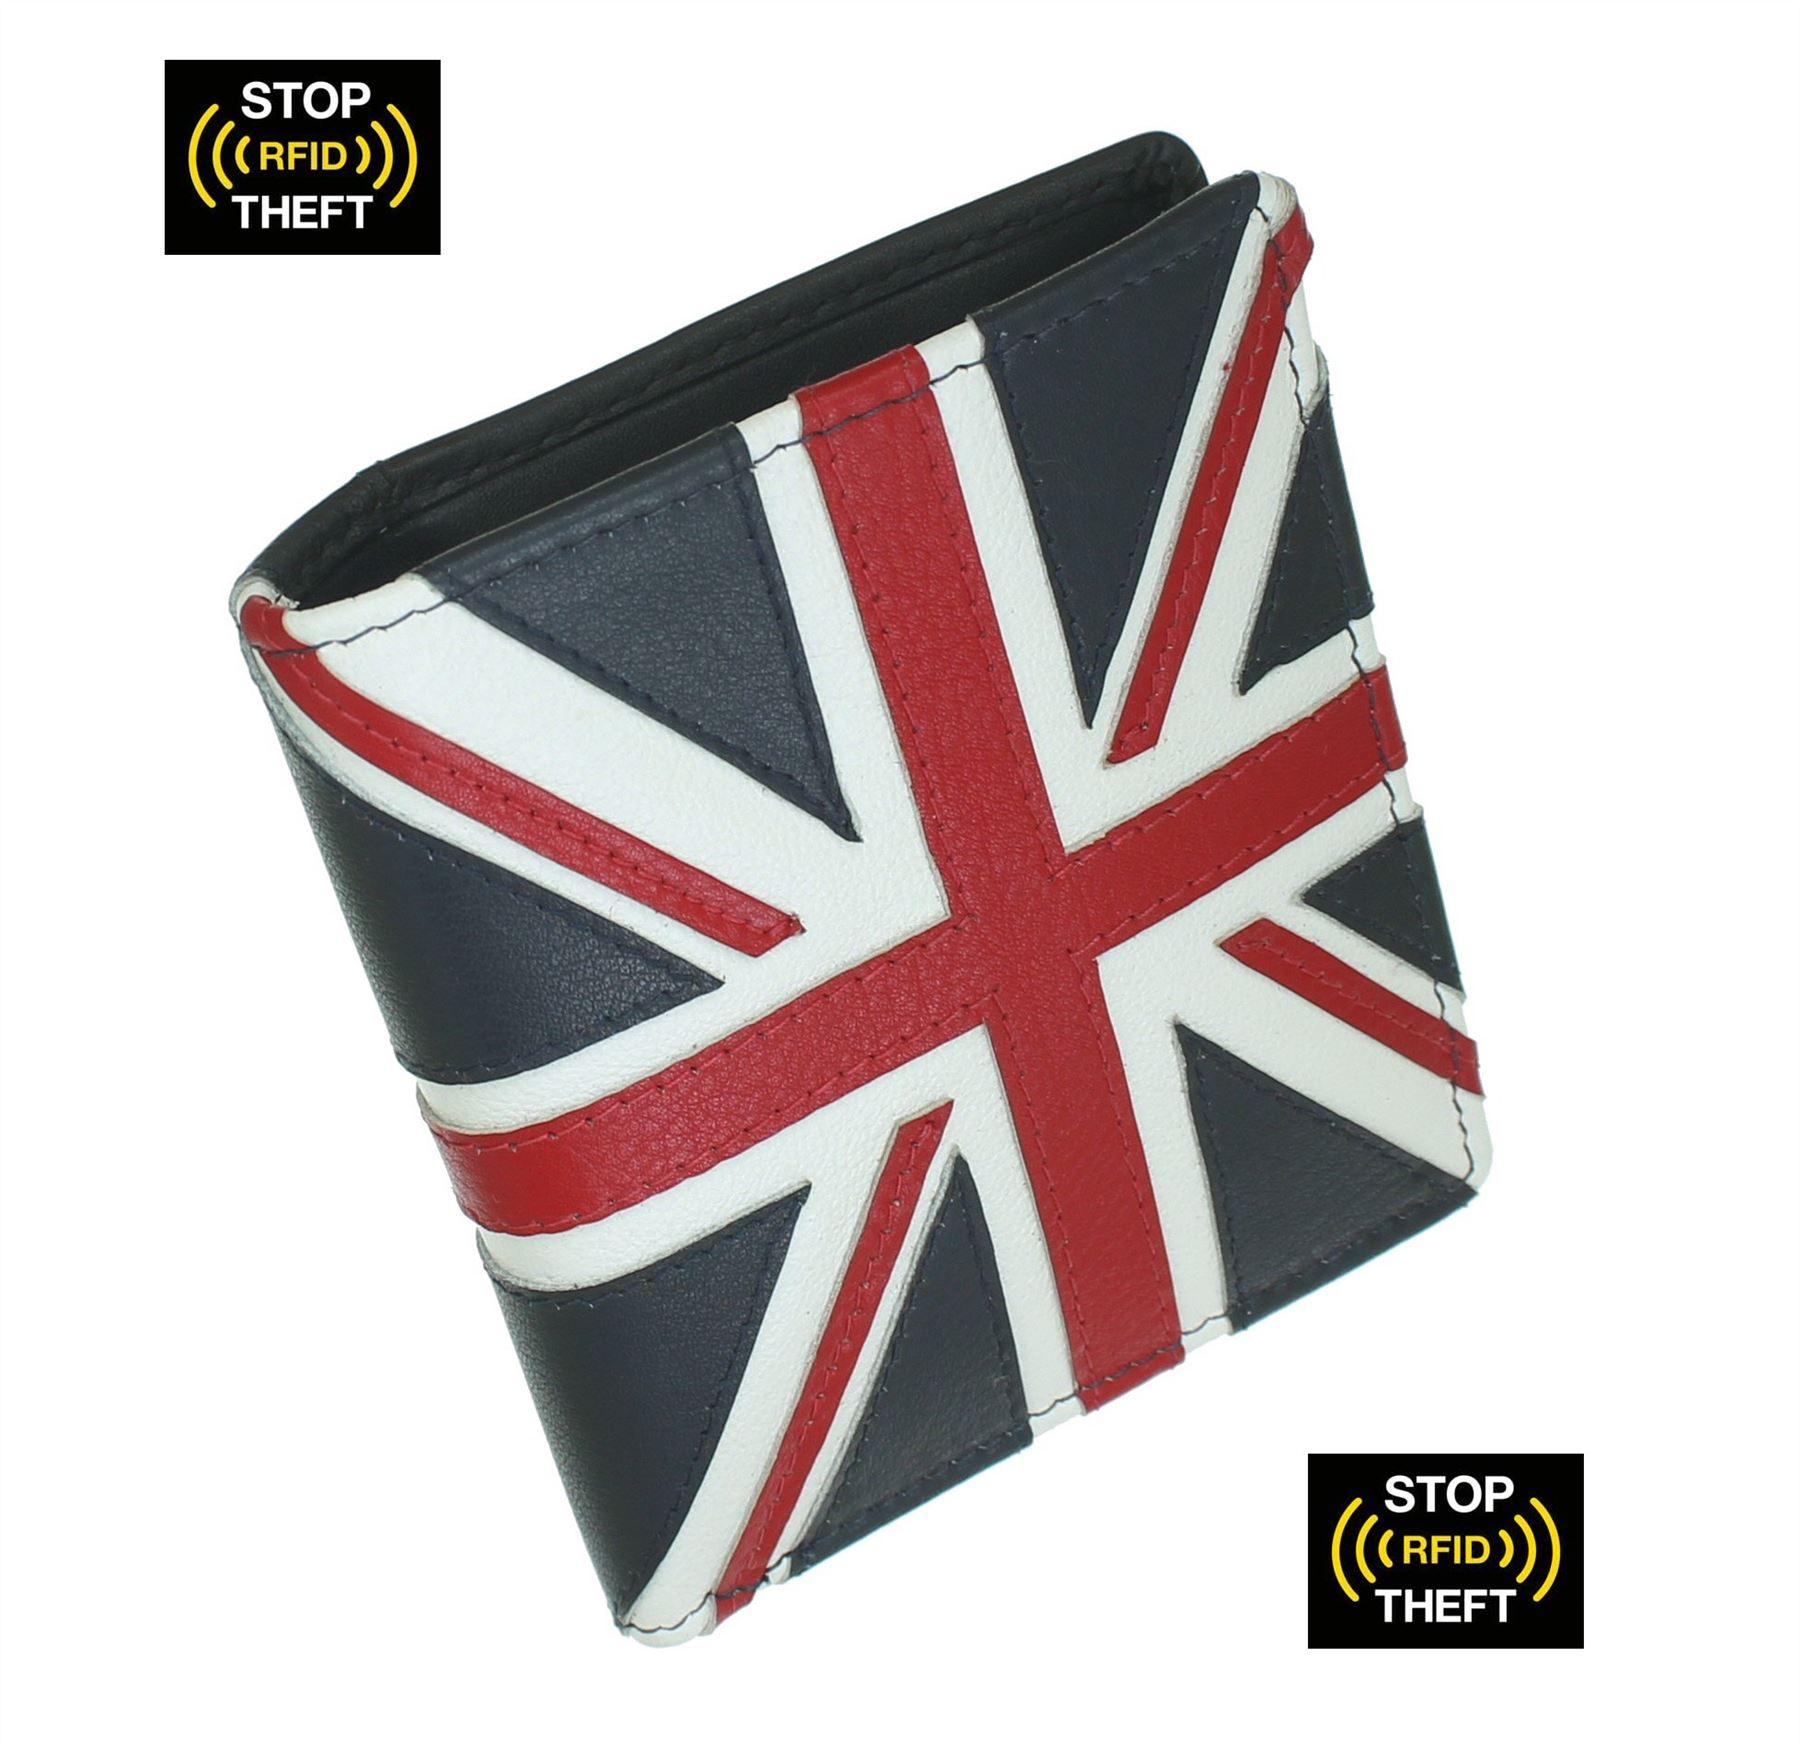 Mala Leather Union Jack Collection Slim Leather Wallet RFID Blocking 199_29